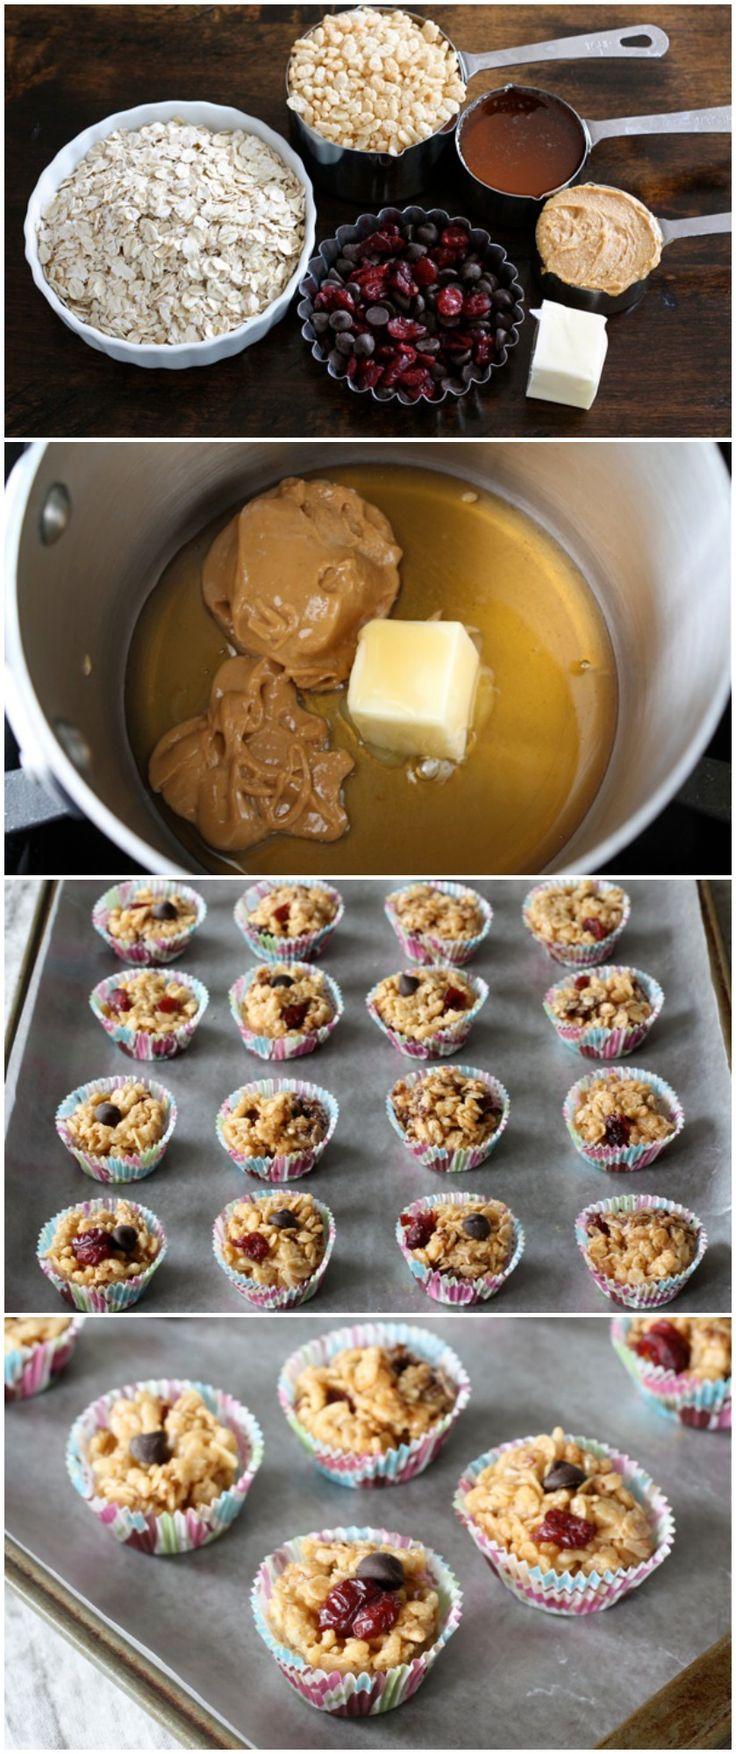 Peanut Butter Granola Balls Recipe on twopeasandtheirpo... Love these easy no-bake treats!